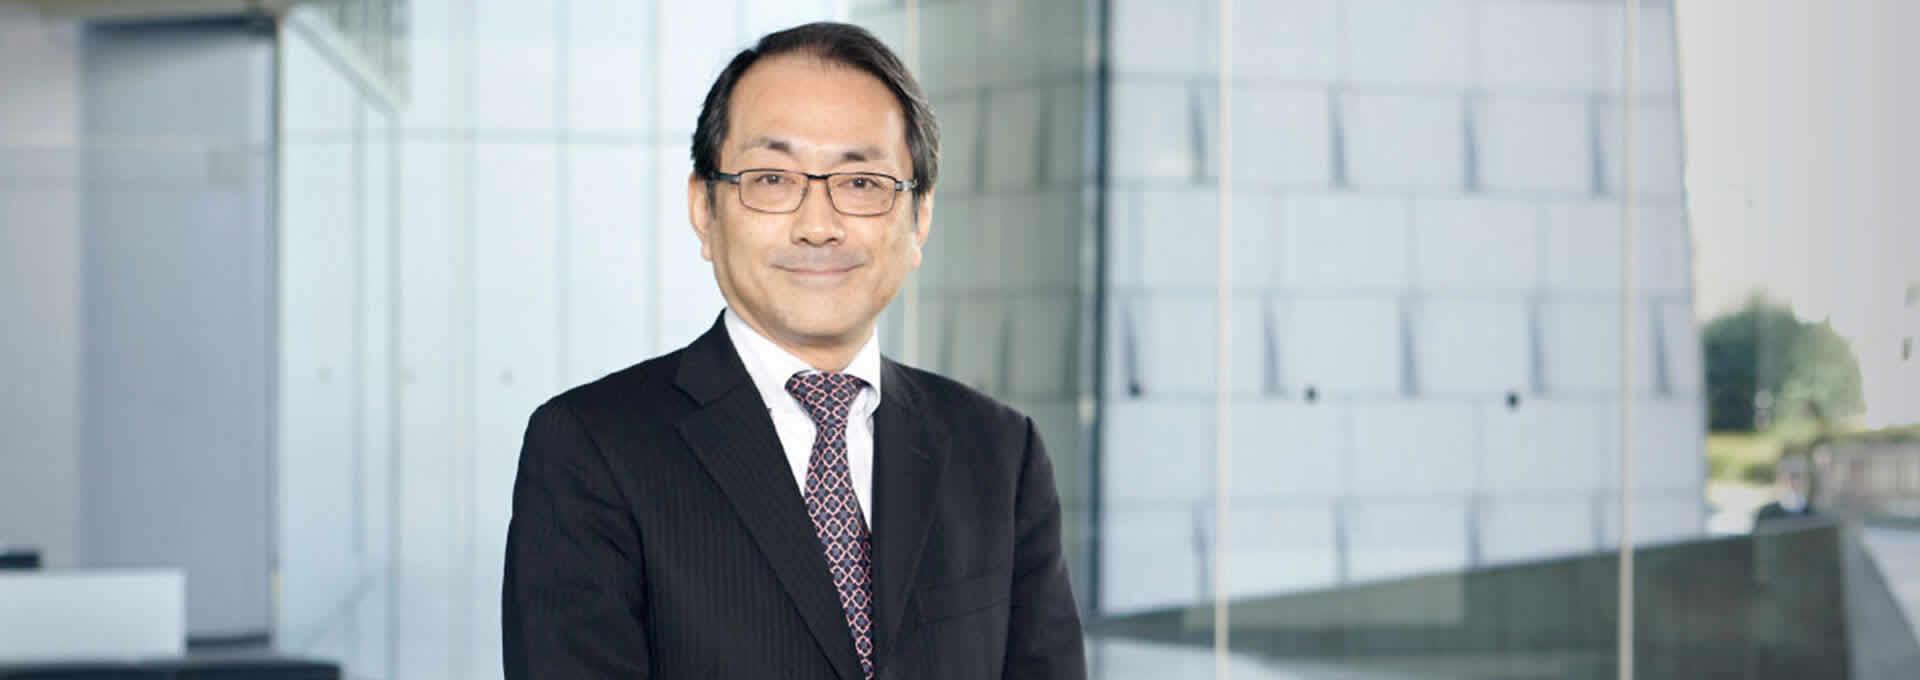 ITO Corporation President Eiji Arai.jpg